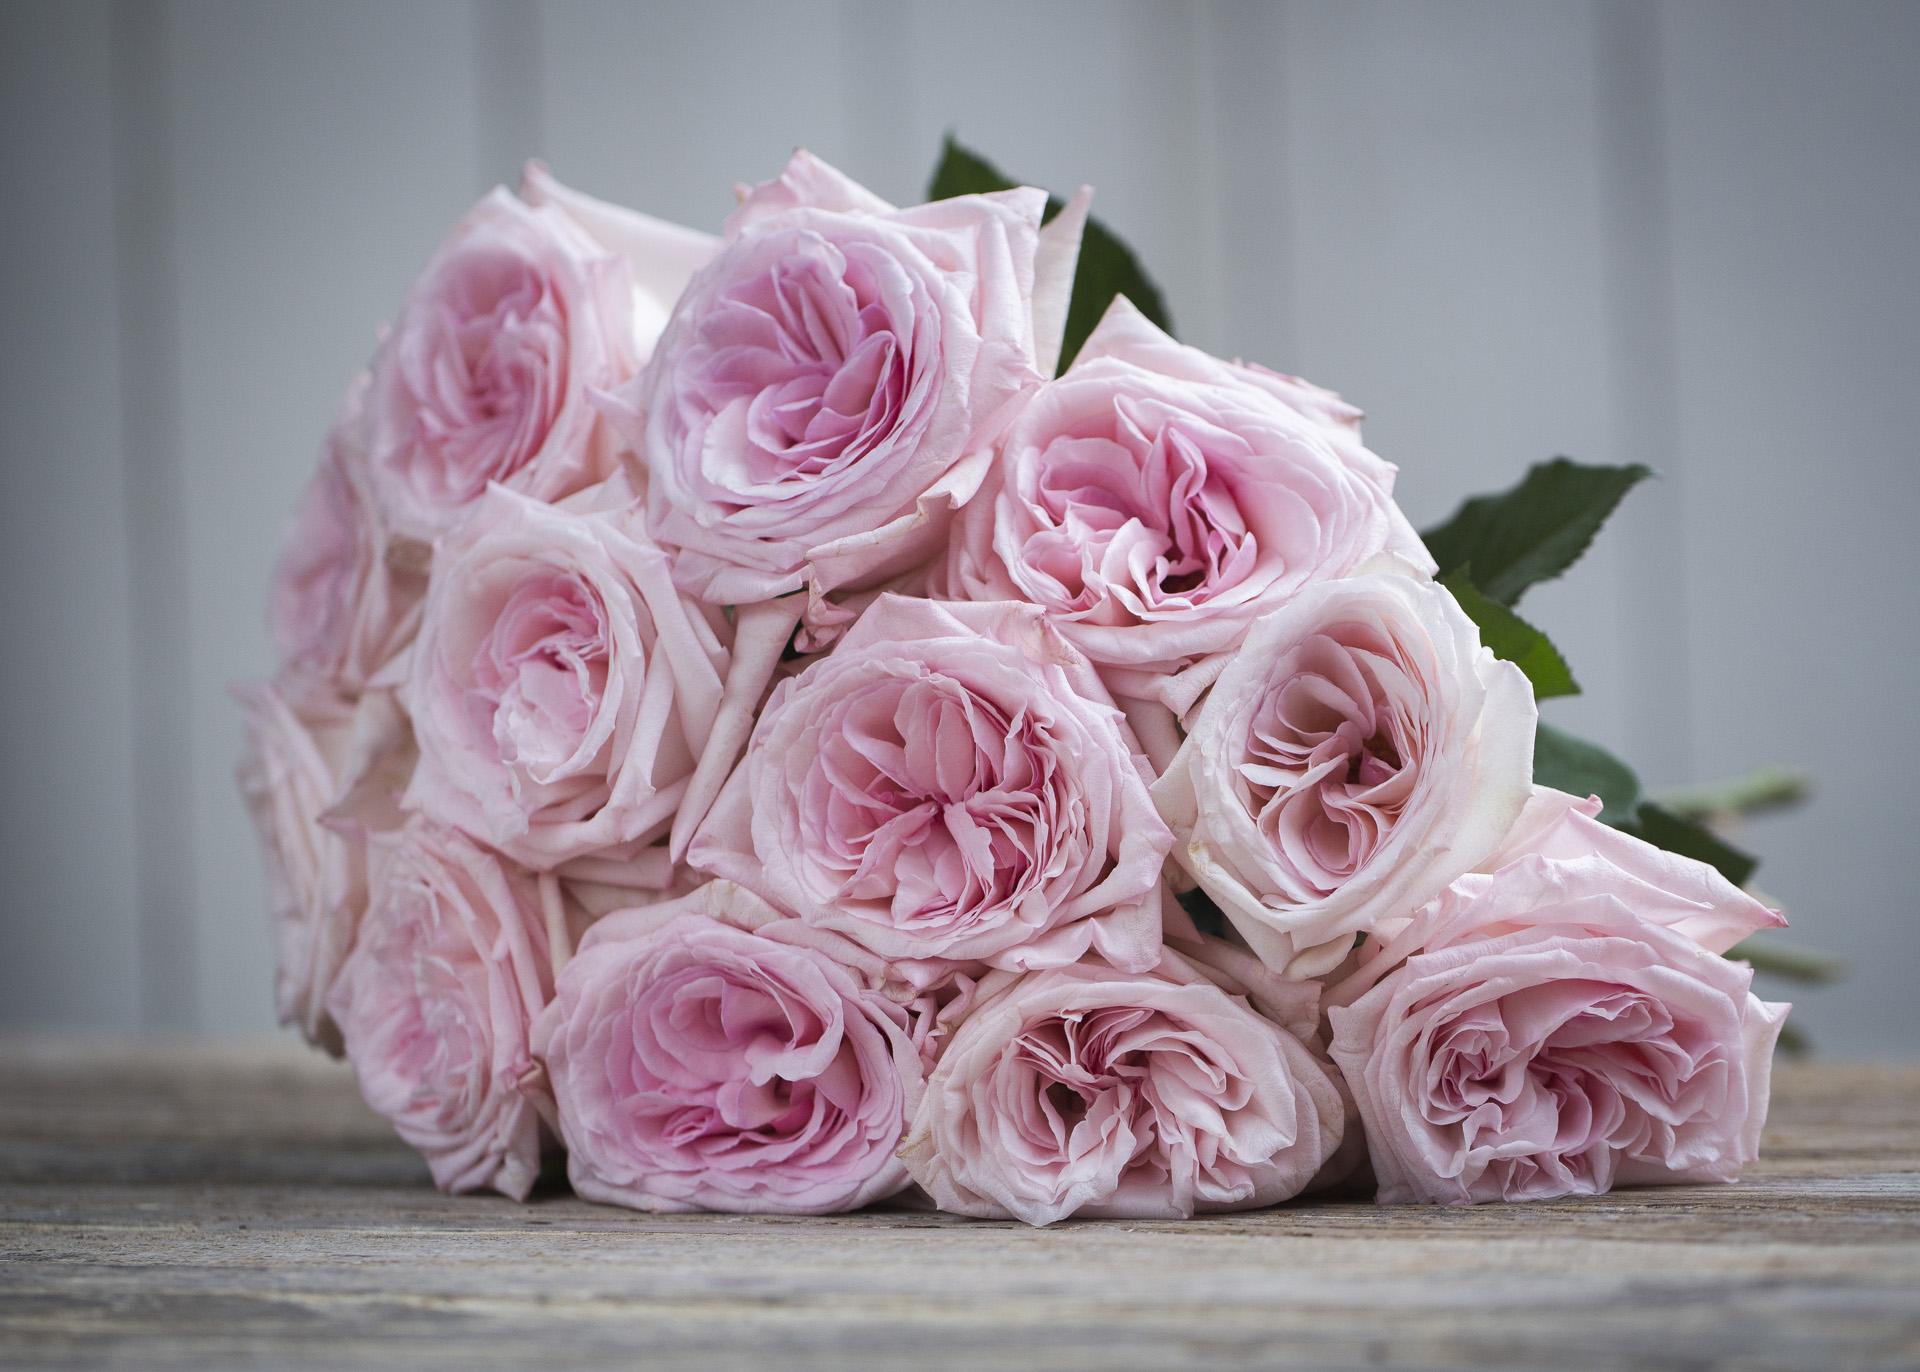 Pink O'Hara scented roses